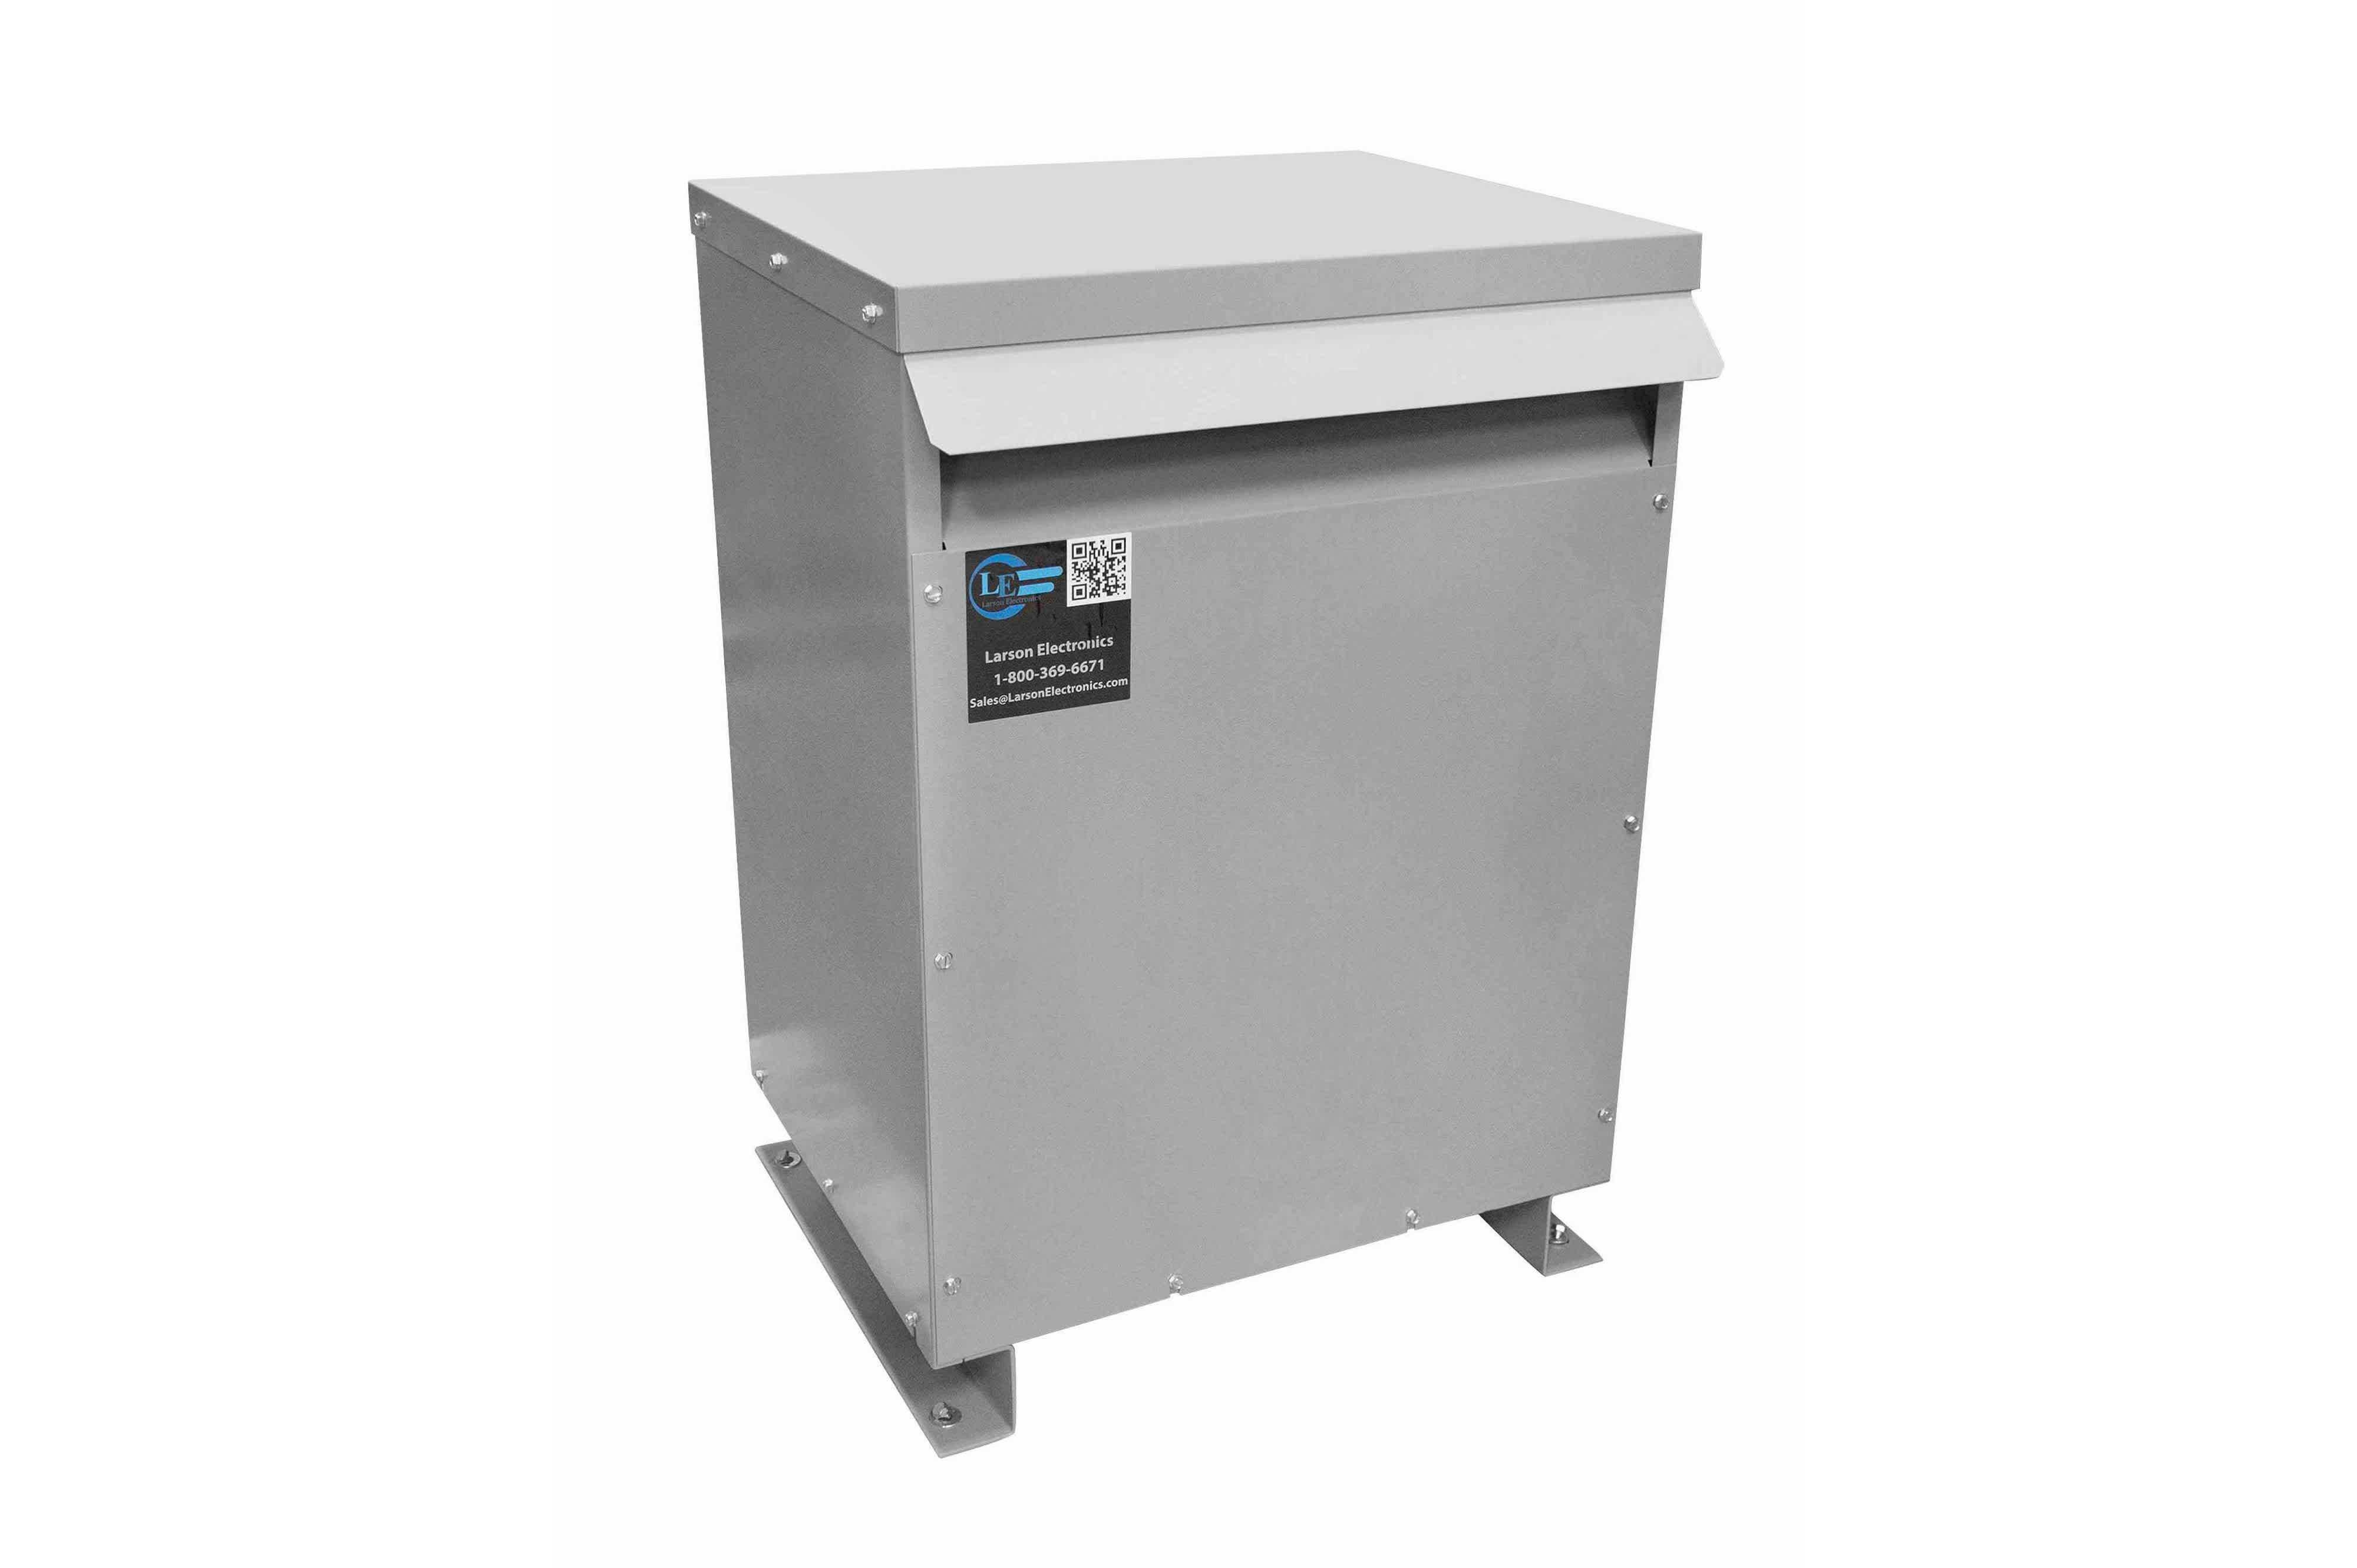 30 kVA 3PH Isolation Transformer, 400V Wye Primary, 600Y/347 Wye-N Secondary, N3R, Ventilated, 60 Hz